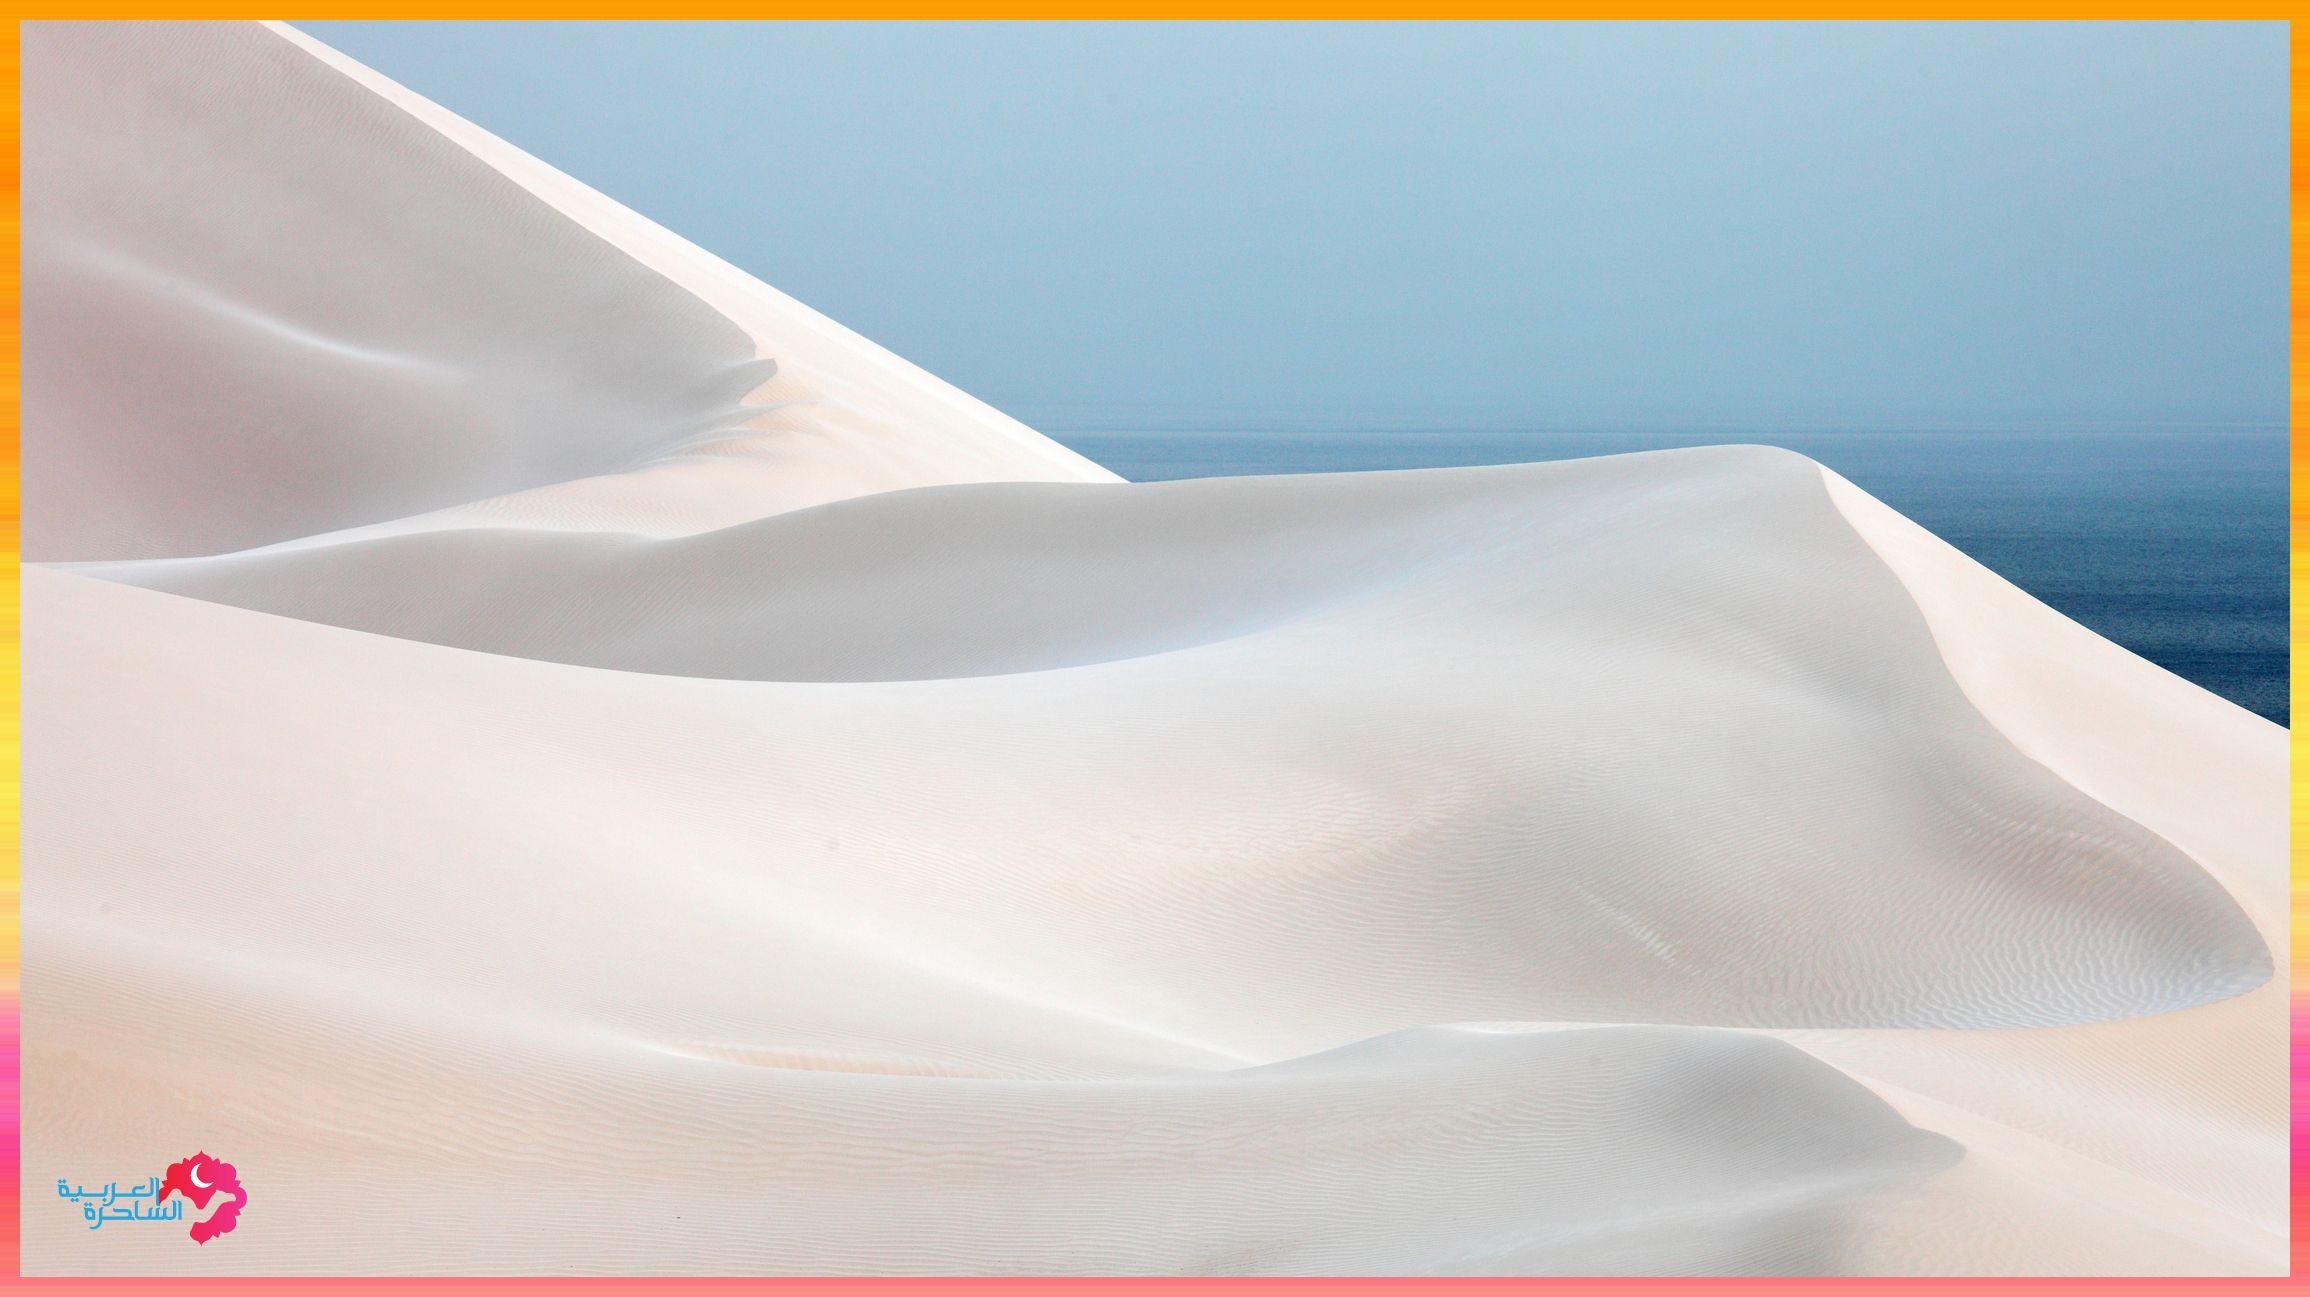 Socotra Island, Yemen جزيرة سوقطرة، اليمن www.magicalarabia.com